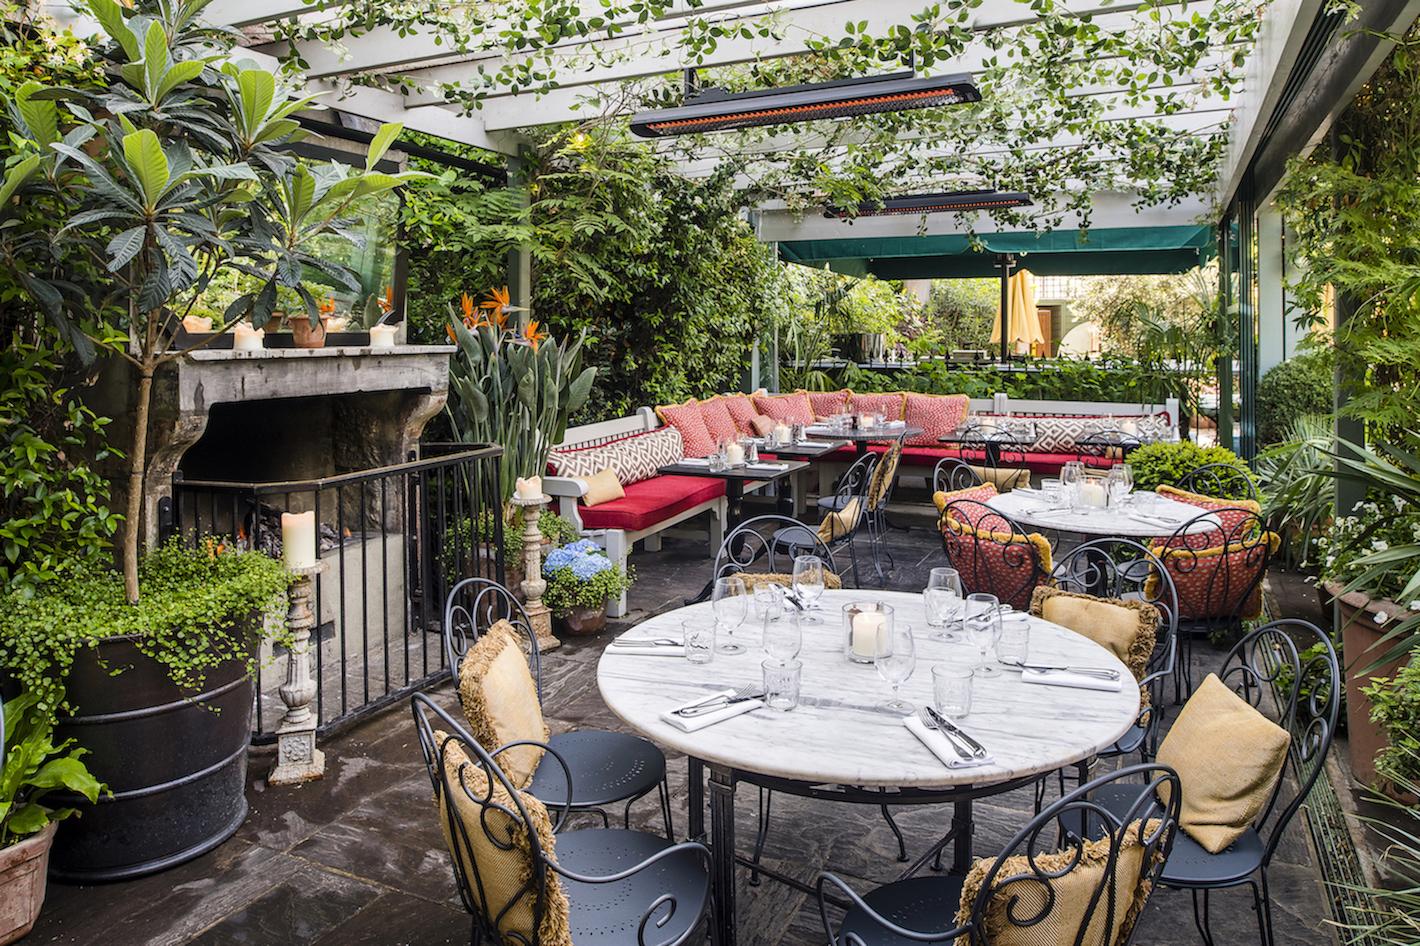 The-Ivy-Chelsea-Garden-Summer-Garden-Humphrey-Munson-Blog-9.jpg